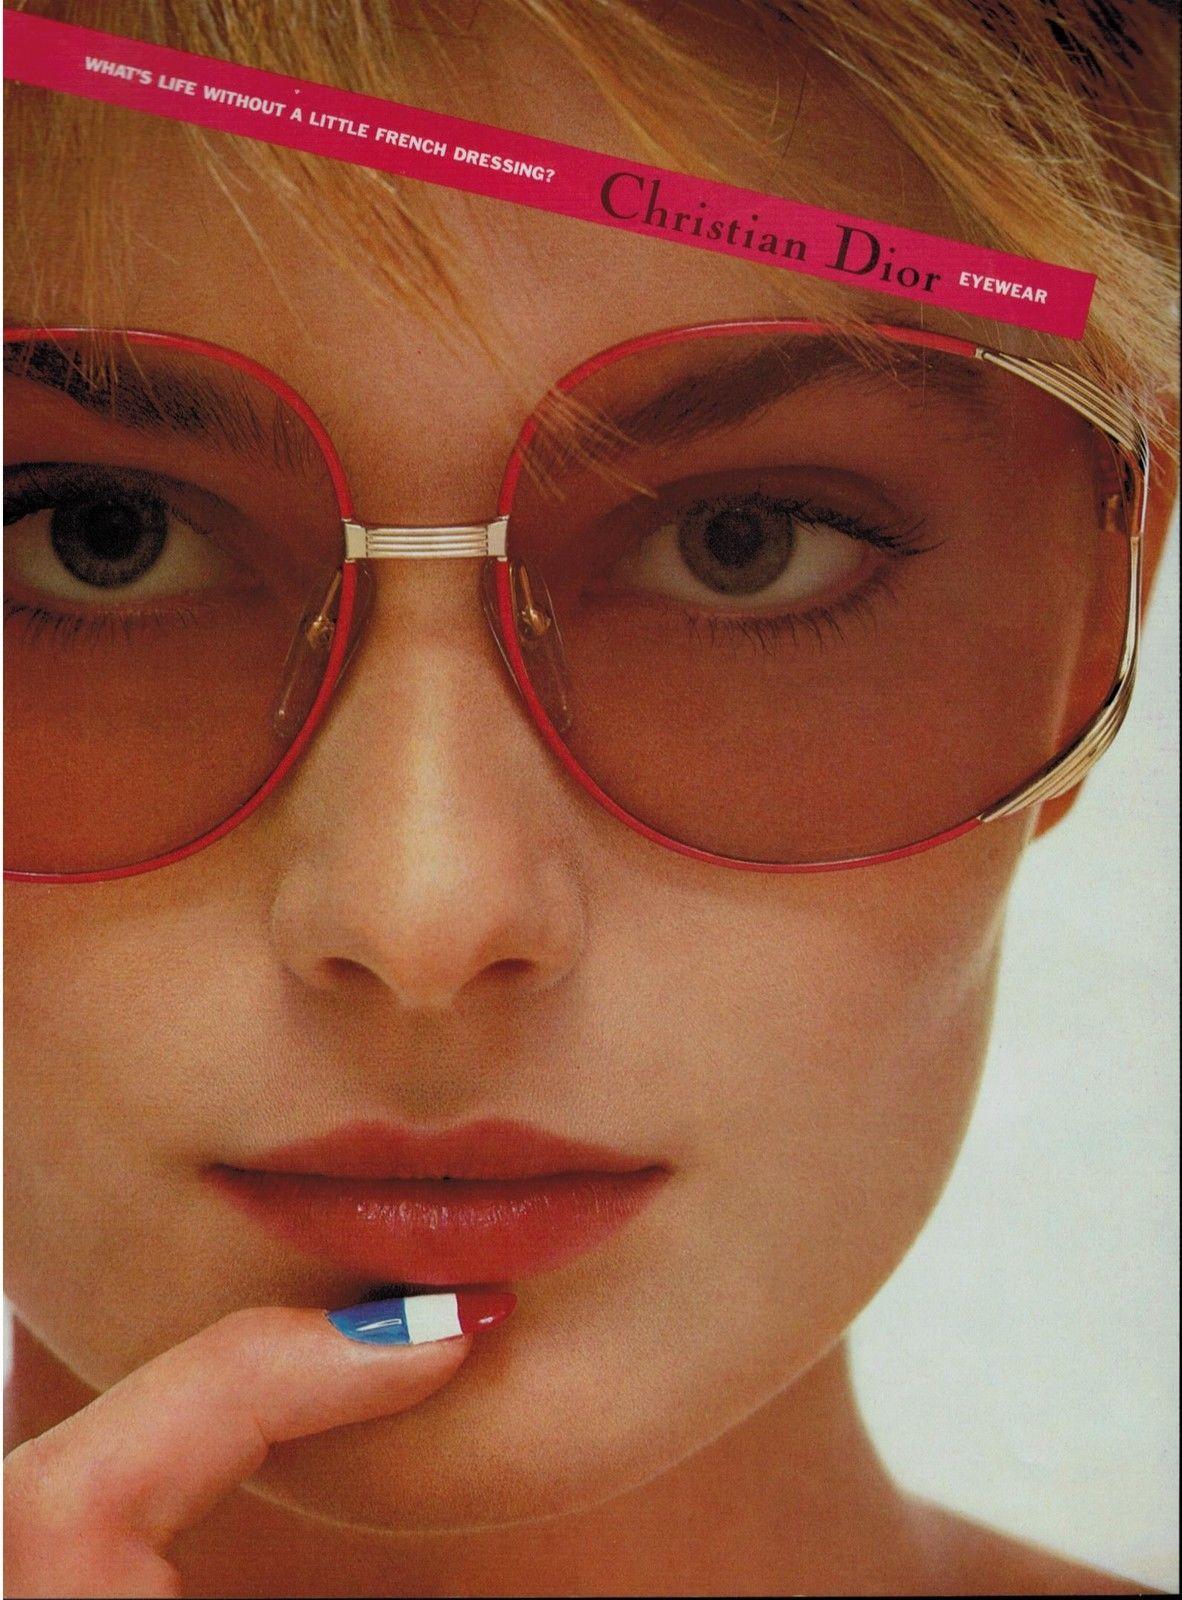 6077dede6bb070 1985 CHRISTIAN DIOR EYEWEAR   PAULINA PORIZKOVA   Vintage Eyewear ...